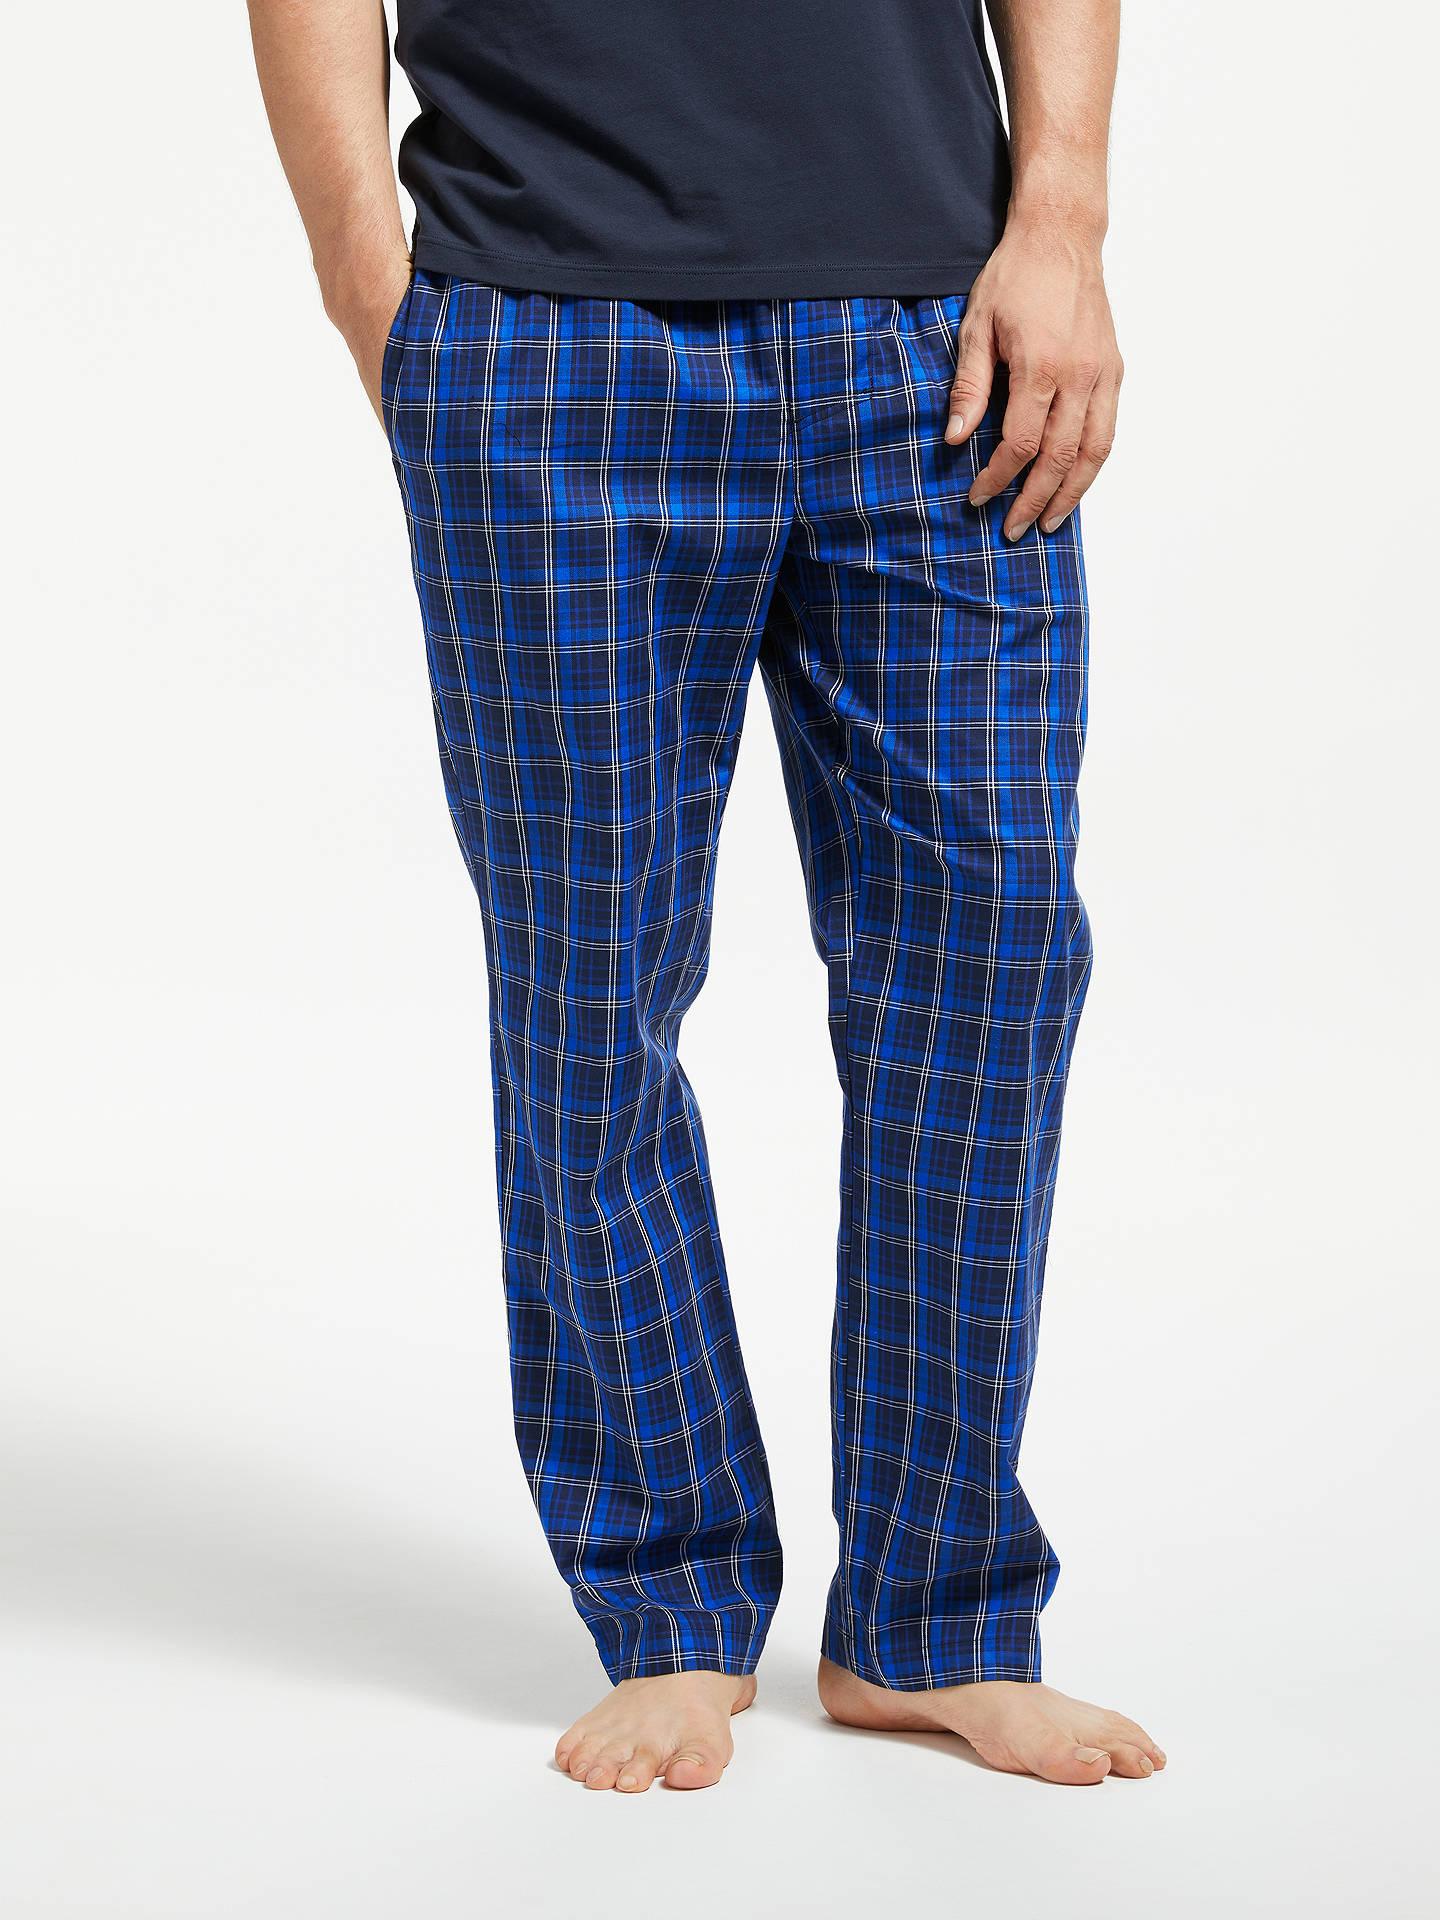 a55ecd53 BOSS Check Twill Lounge Pants, Blue at John Lewis & Partners